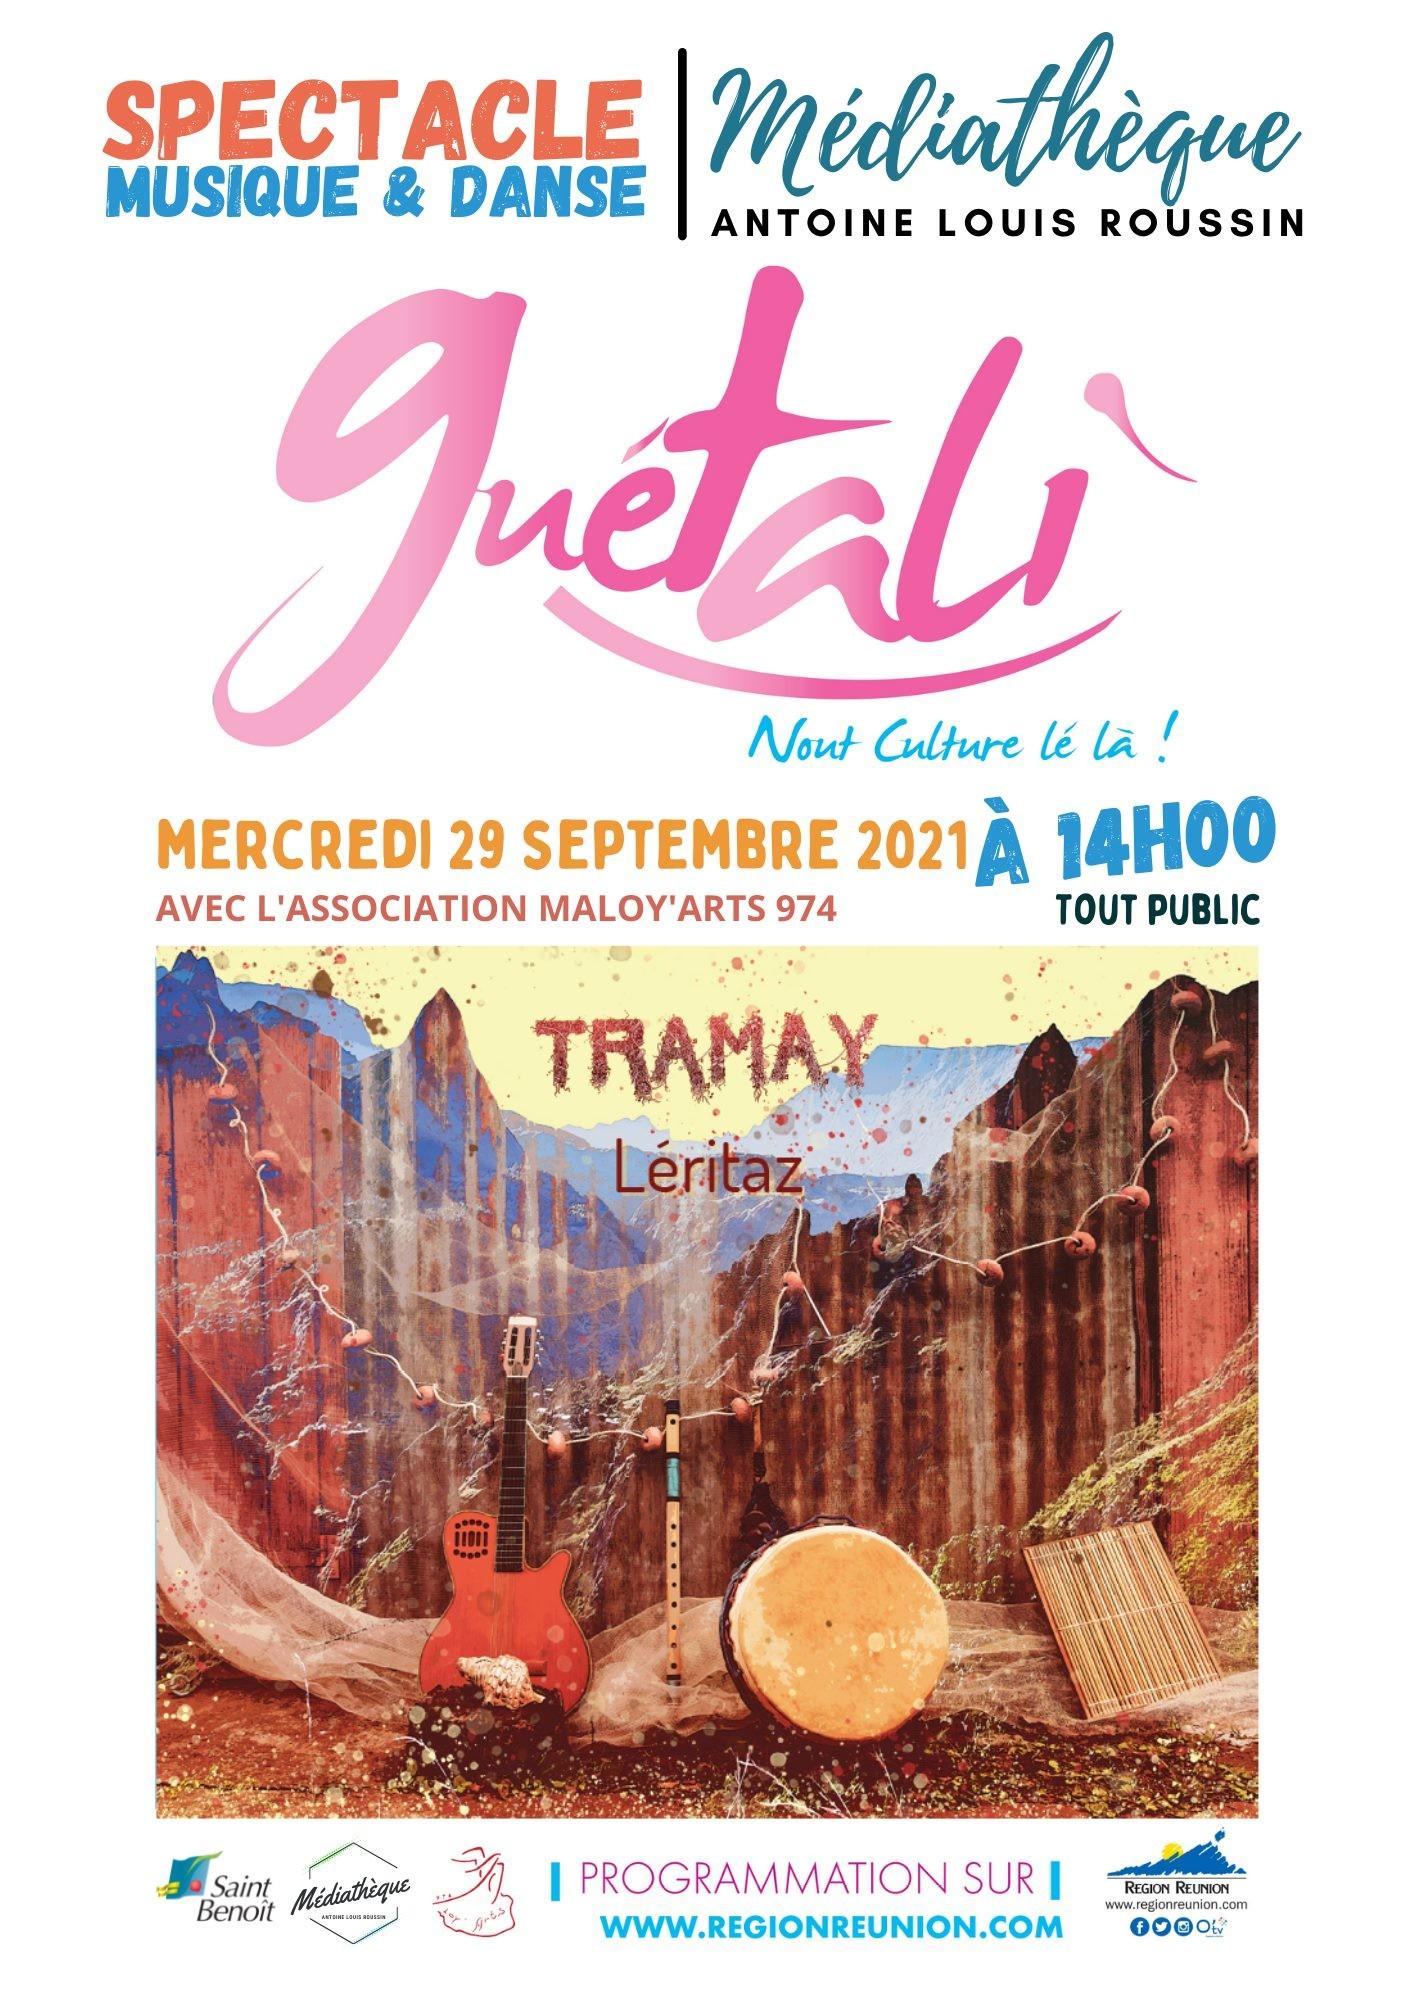 Concert-spectacle Tramay Léritaz Guétali 2021 Médiathèque St Benoît